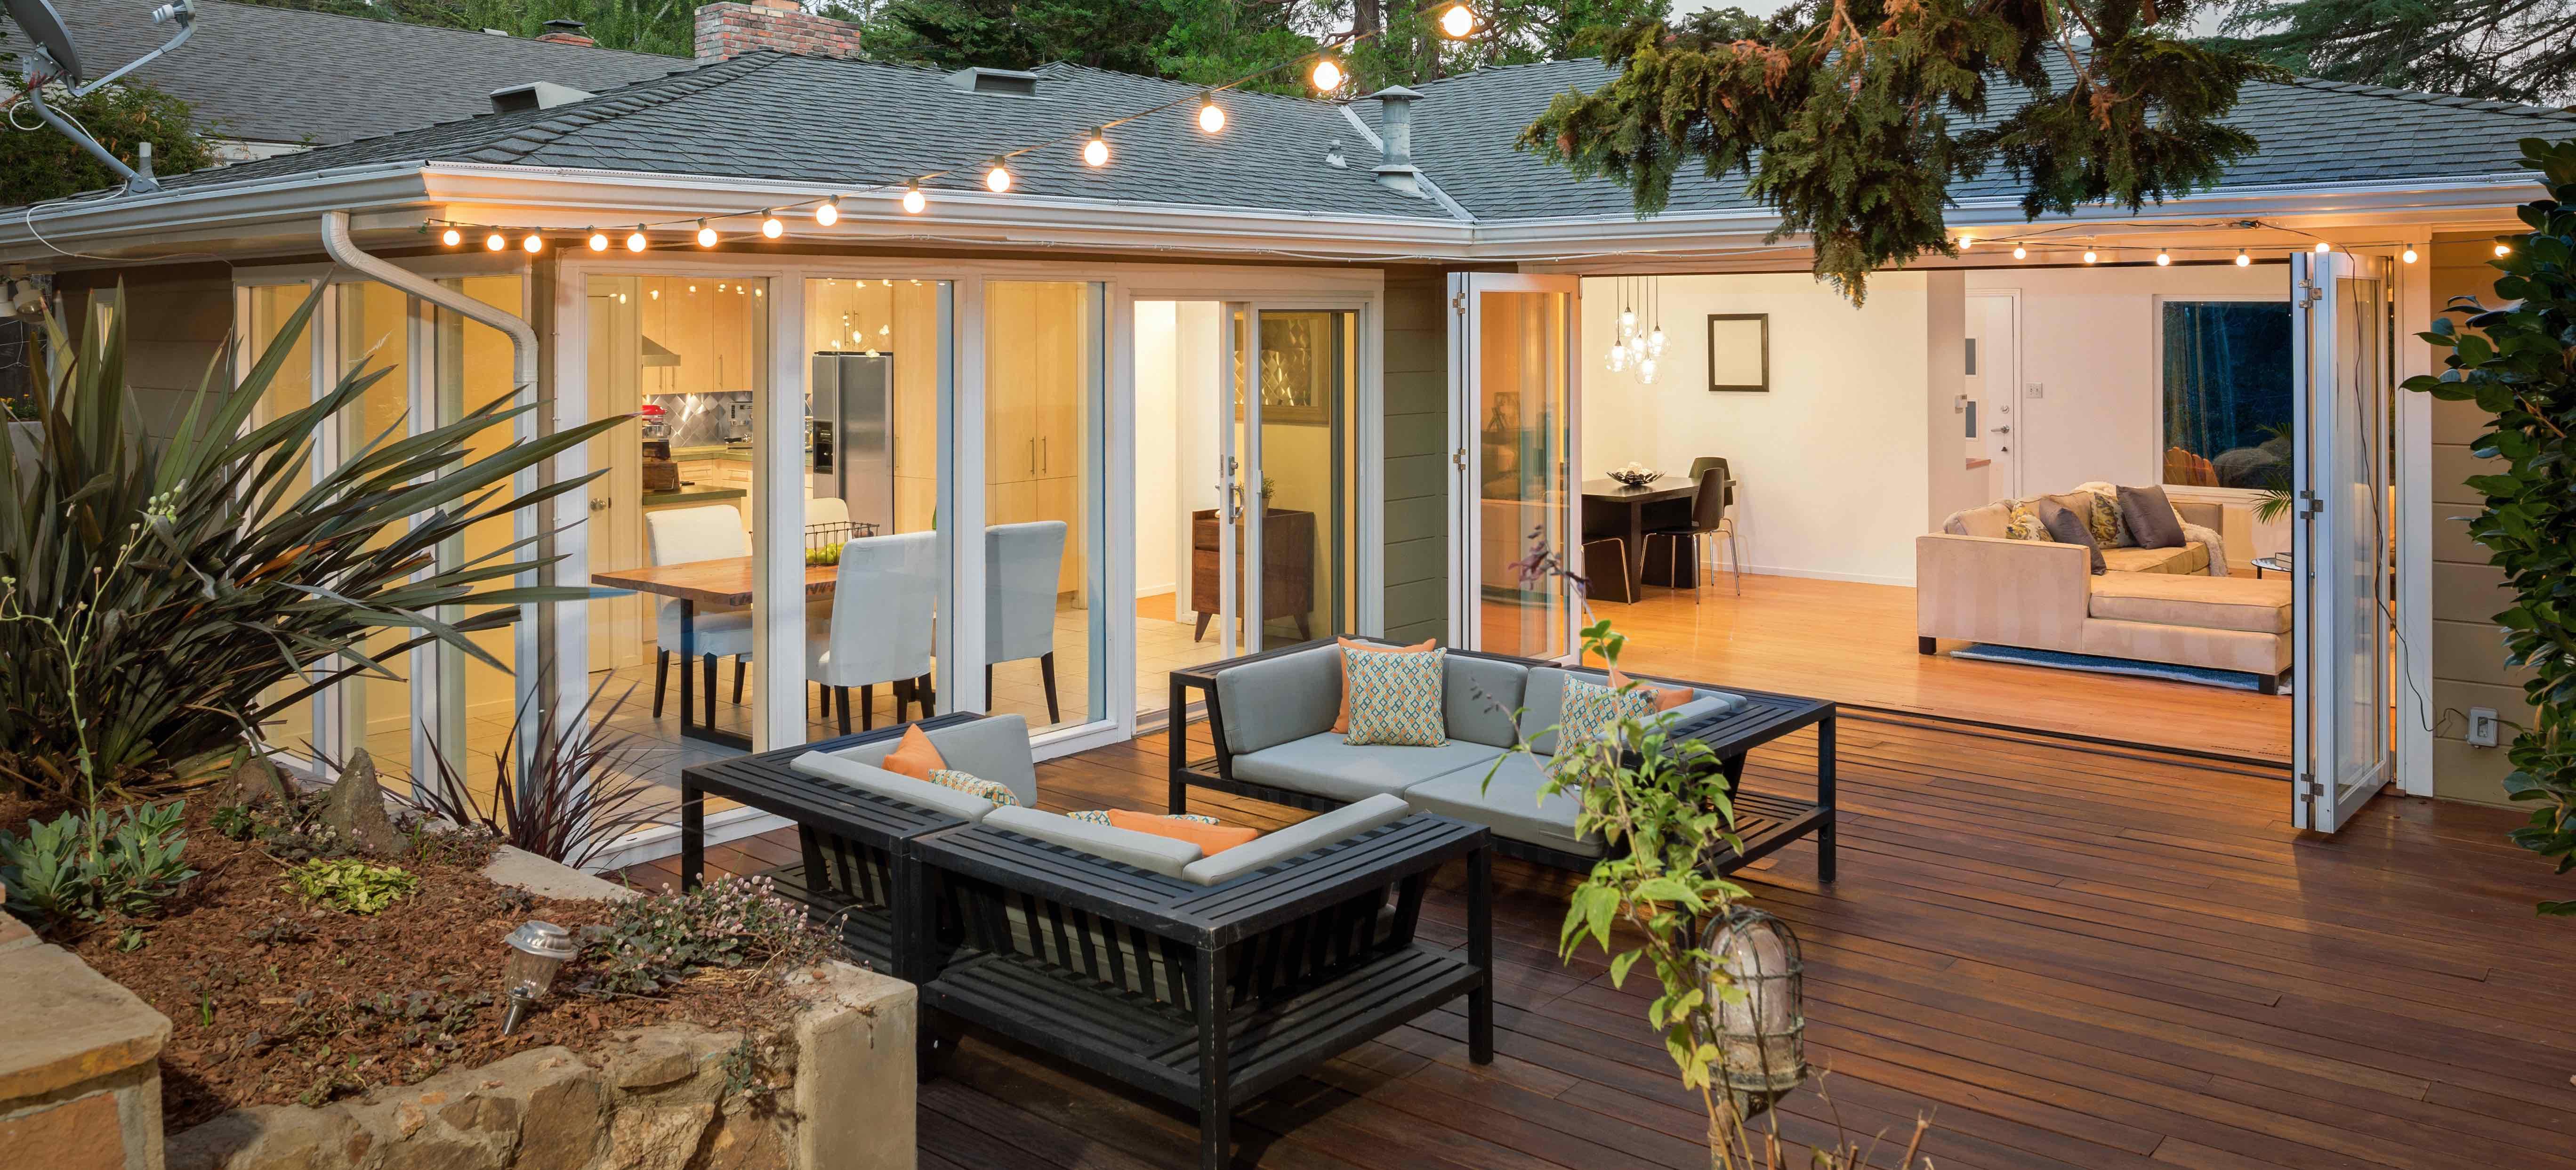 Residential   Patios / Decks